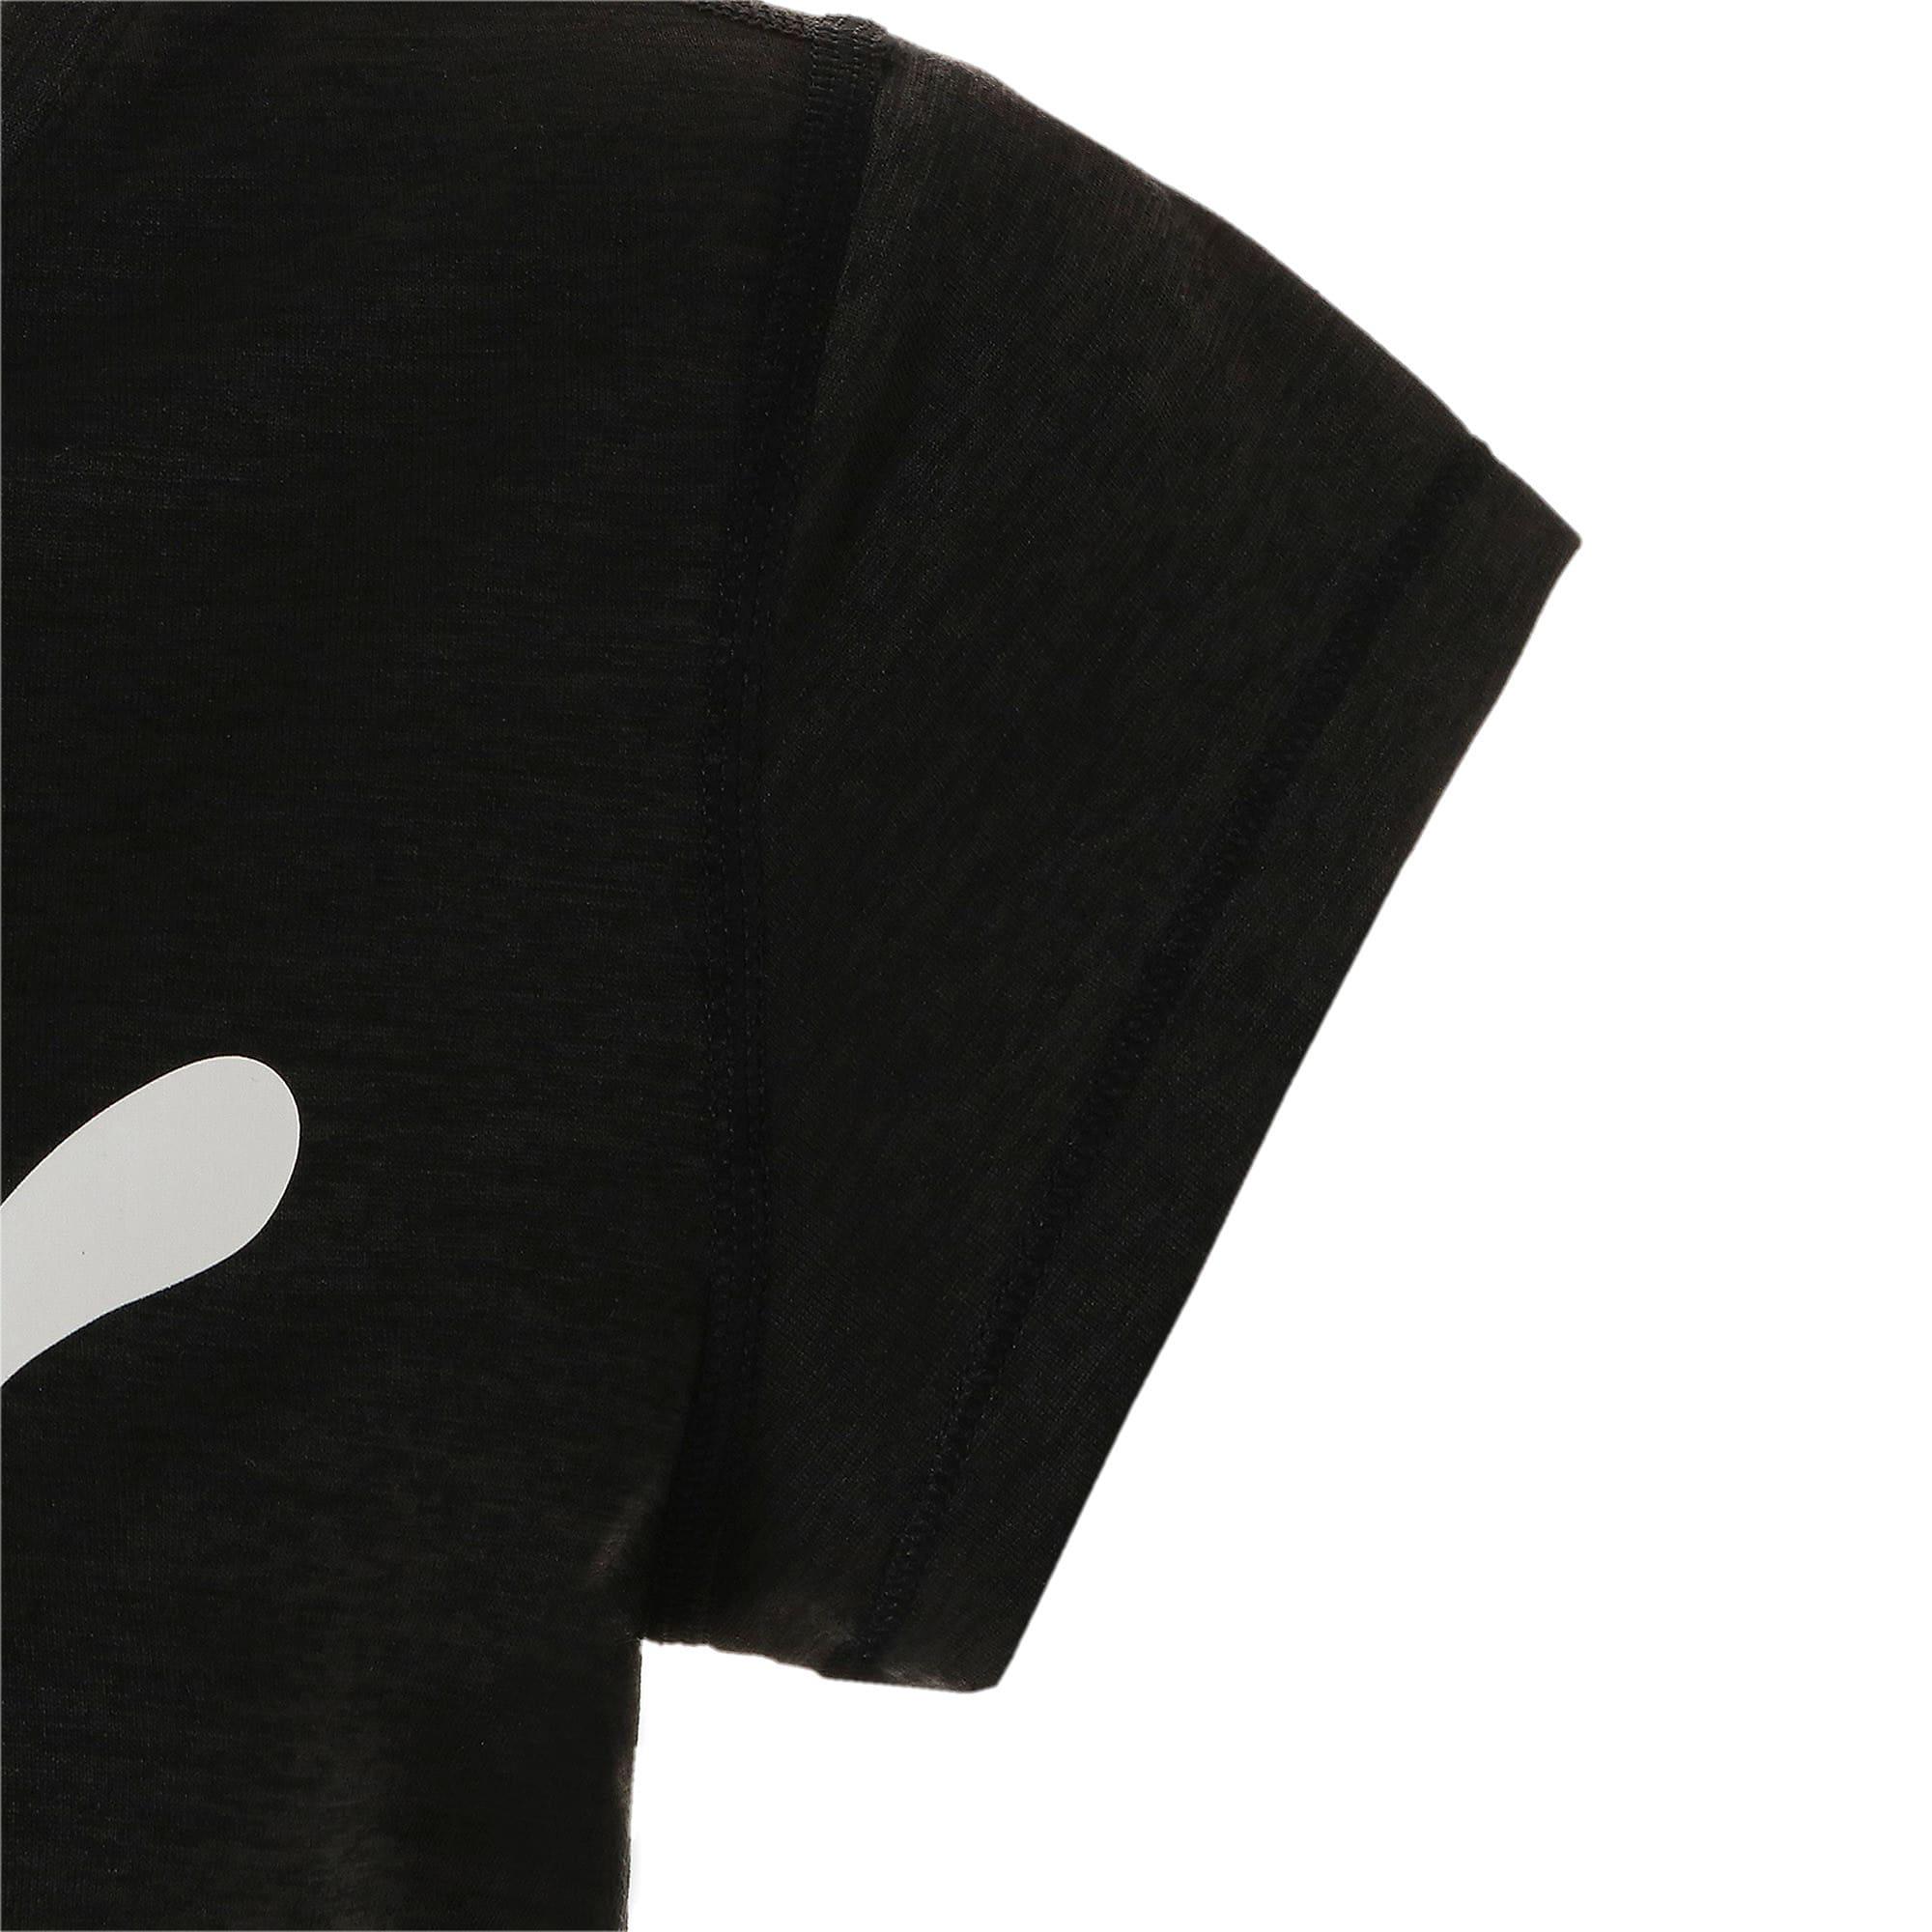 Thumbnail 8 of ヘザー キャット ウィメンズ ランニング Tシャツ 半袖, Puma Black, medium-JPN